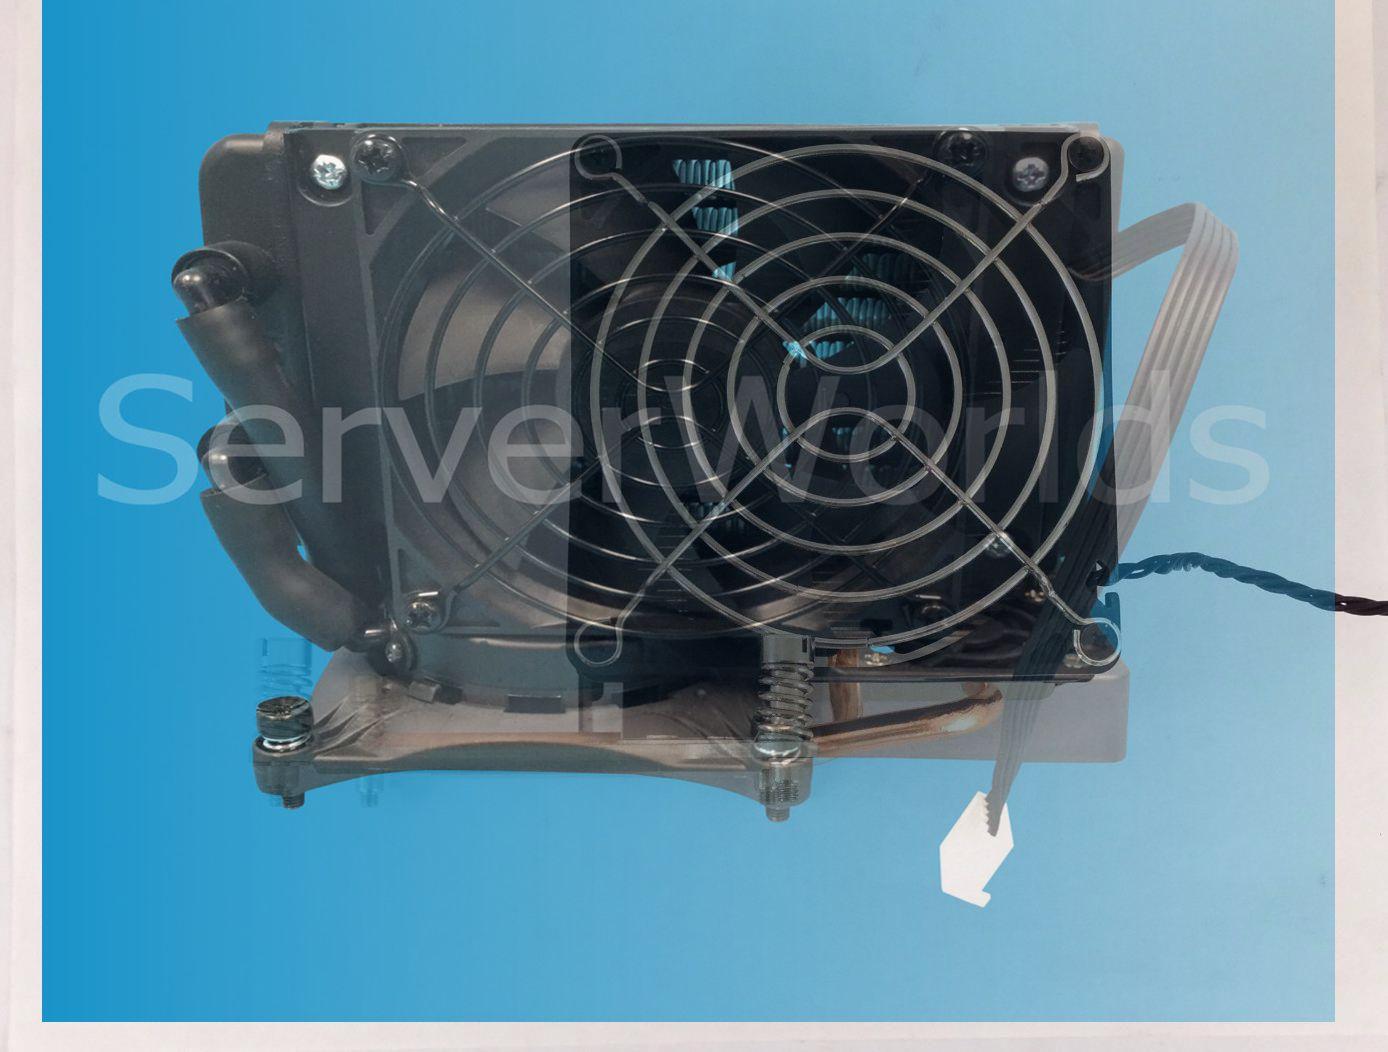 z420 Liquid cooler and Fan Heatsink overlaid_5.28.17..jpg